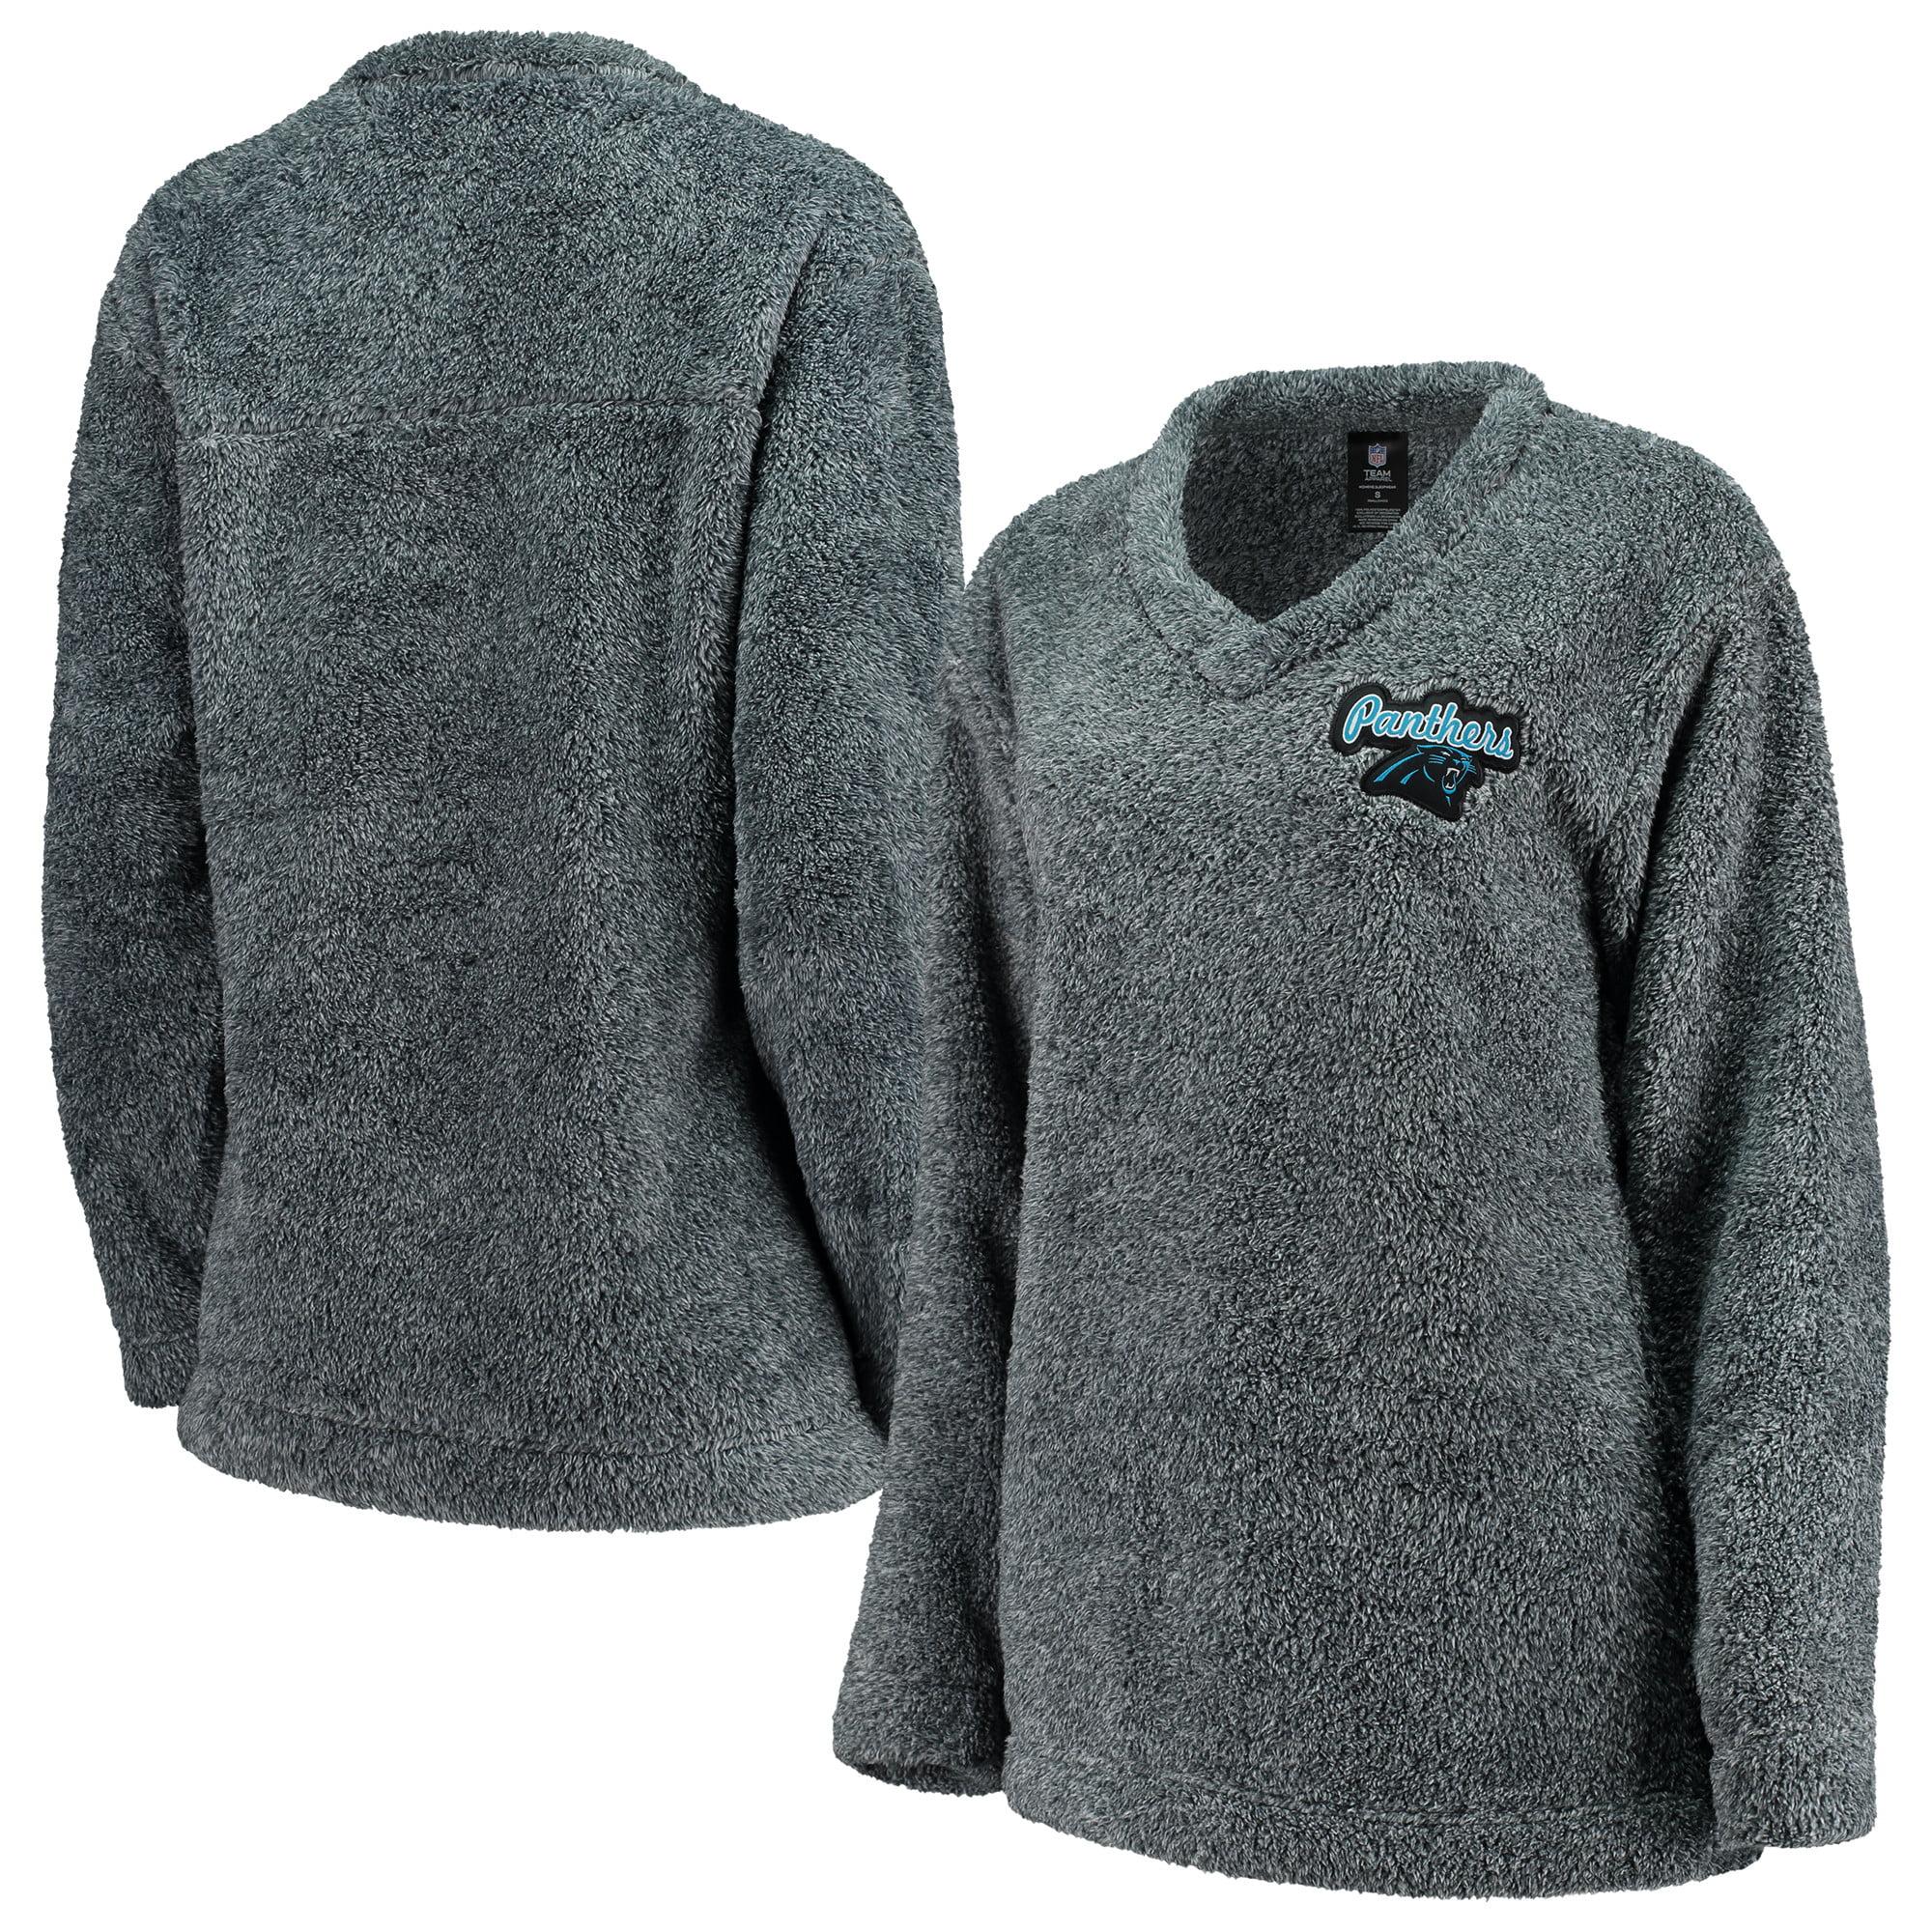 Carolina Panthers Concepts Sport Women's Trifecta Pullover Sweatshirt - Charcoal